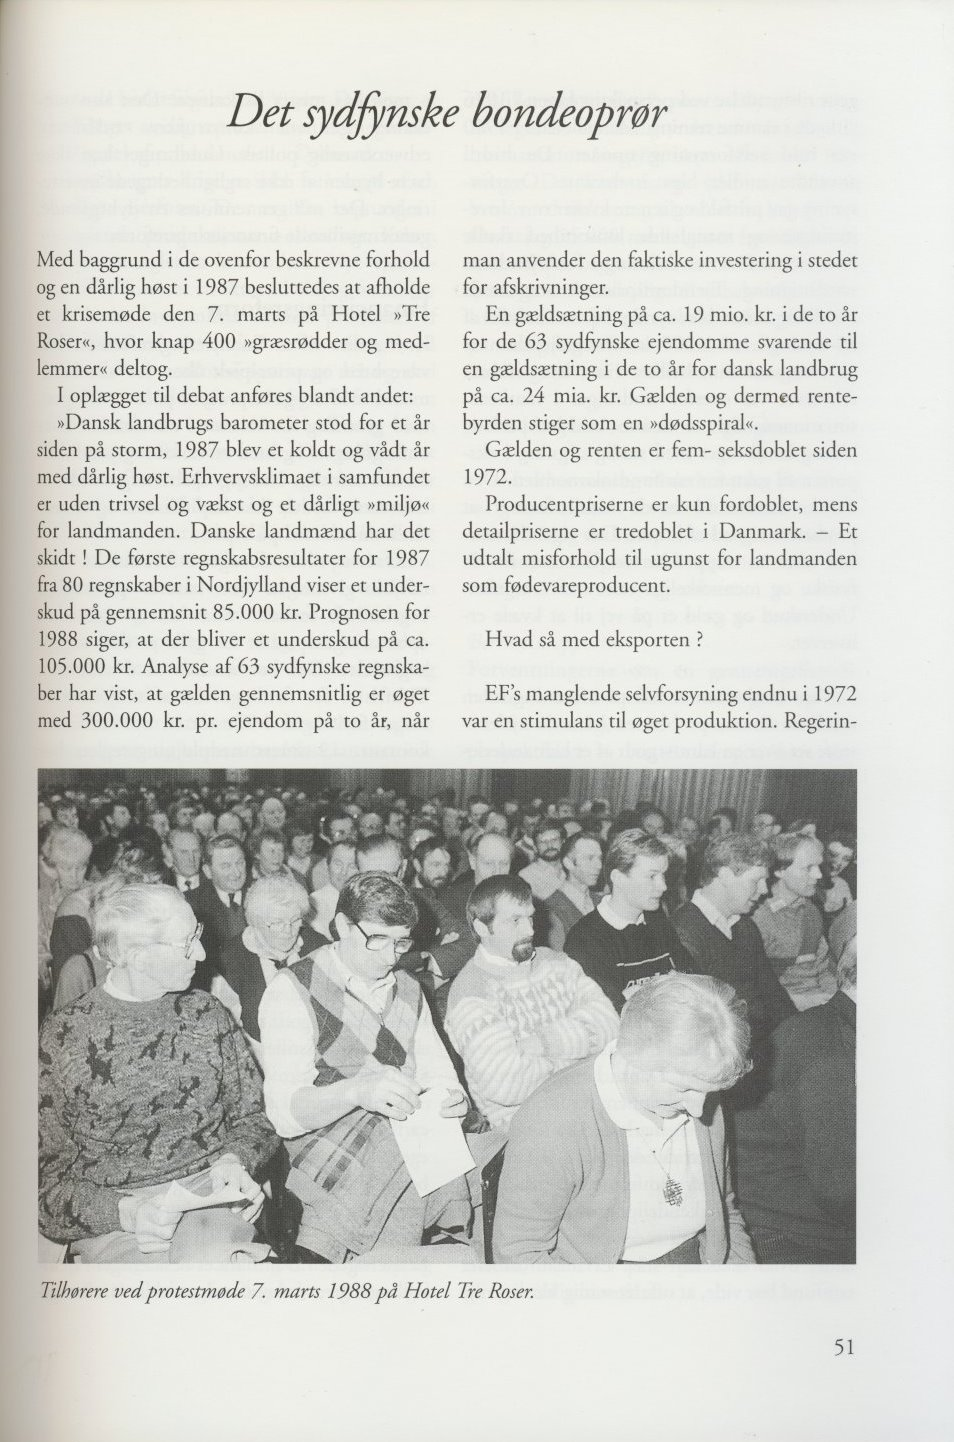 Sv. & Omegns landbf 1901-2001 - Det sydfynske bondeoprør